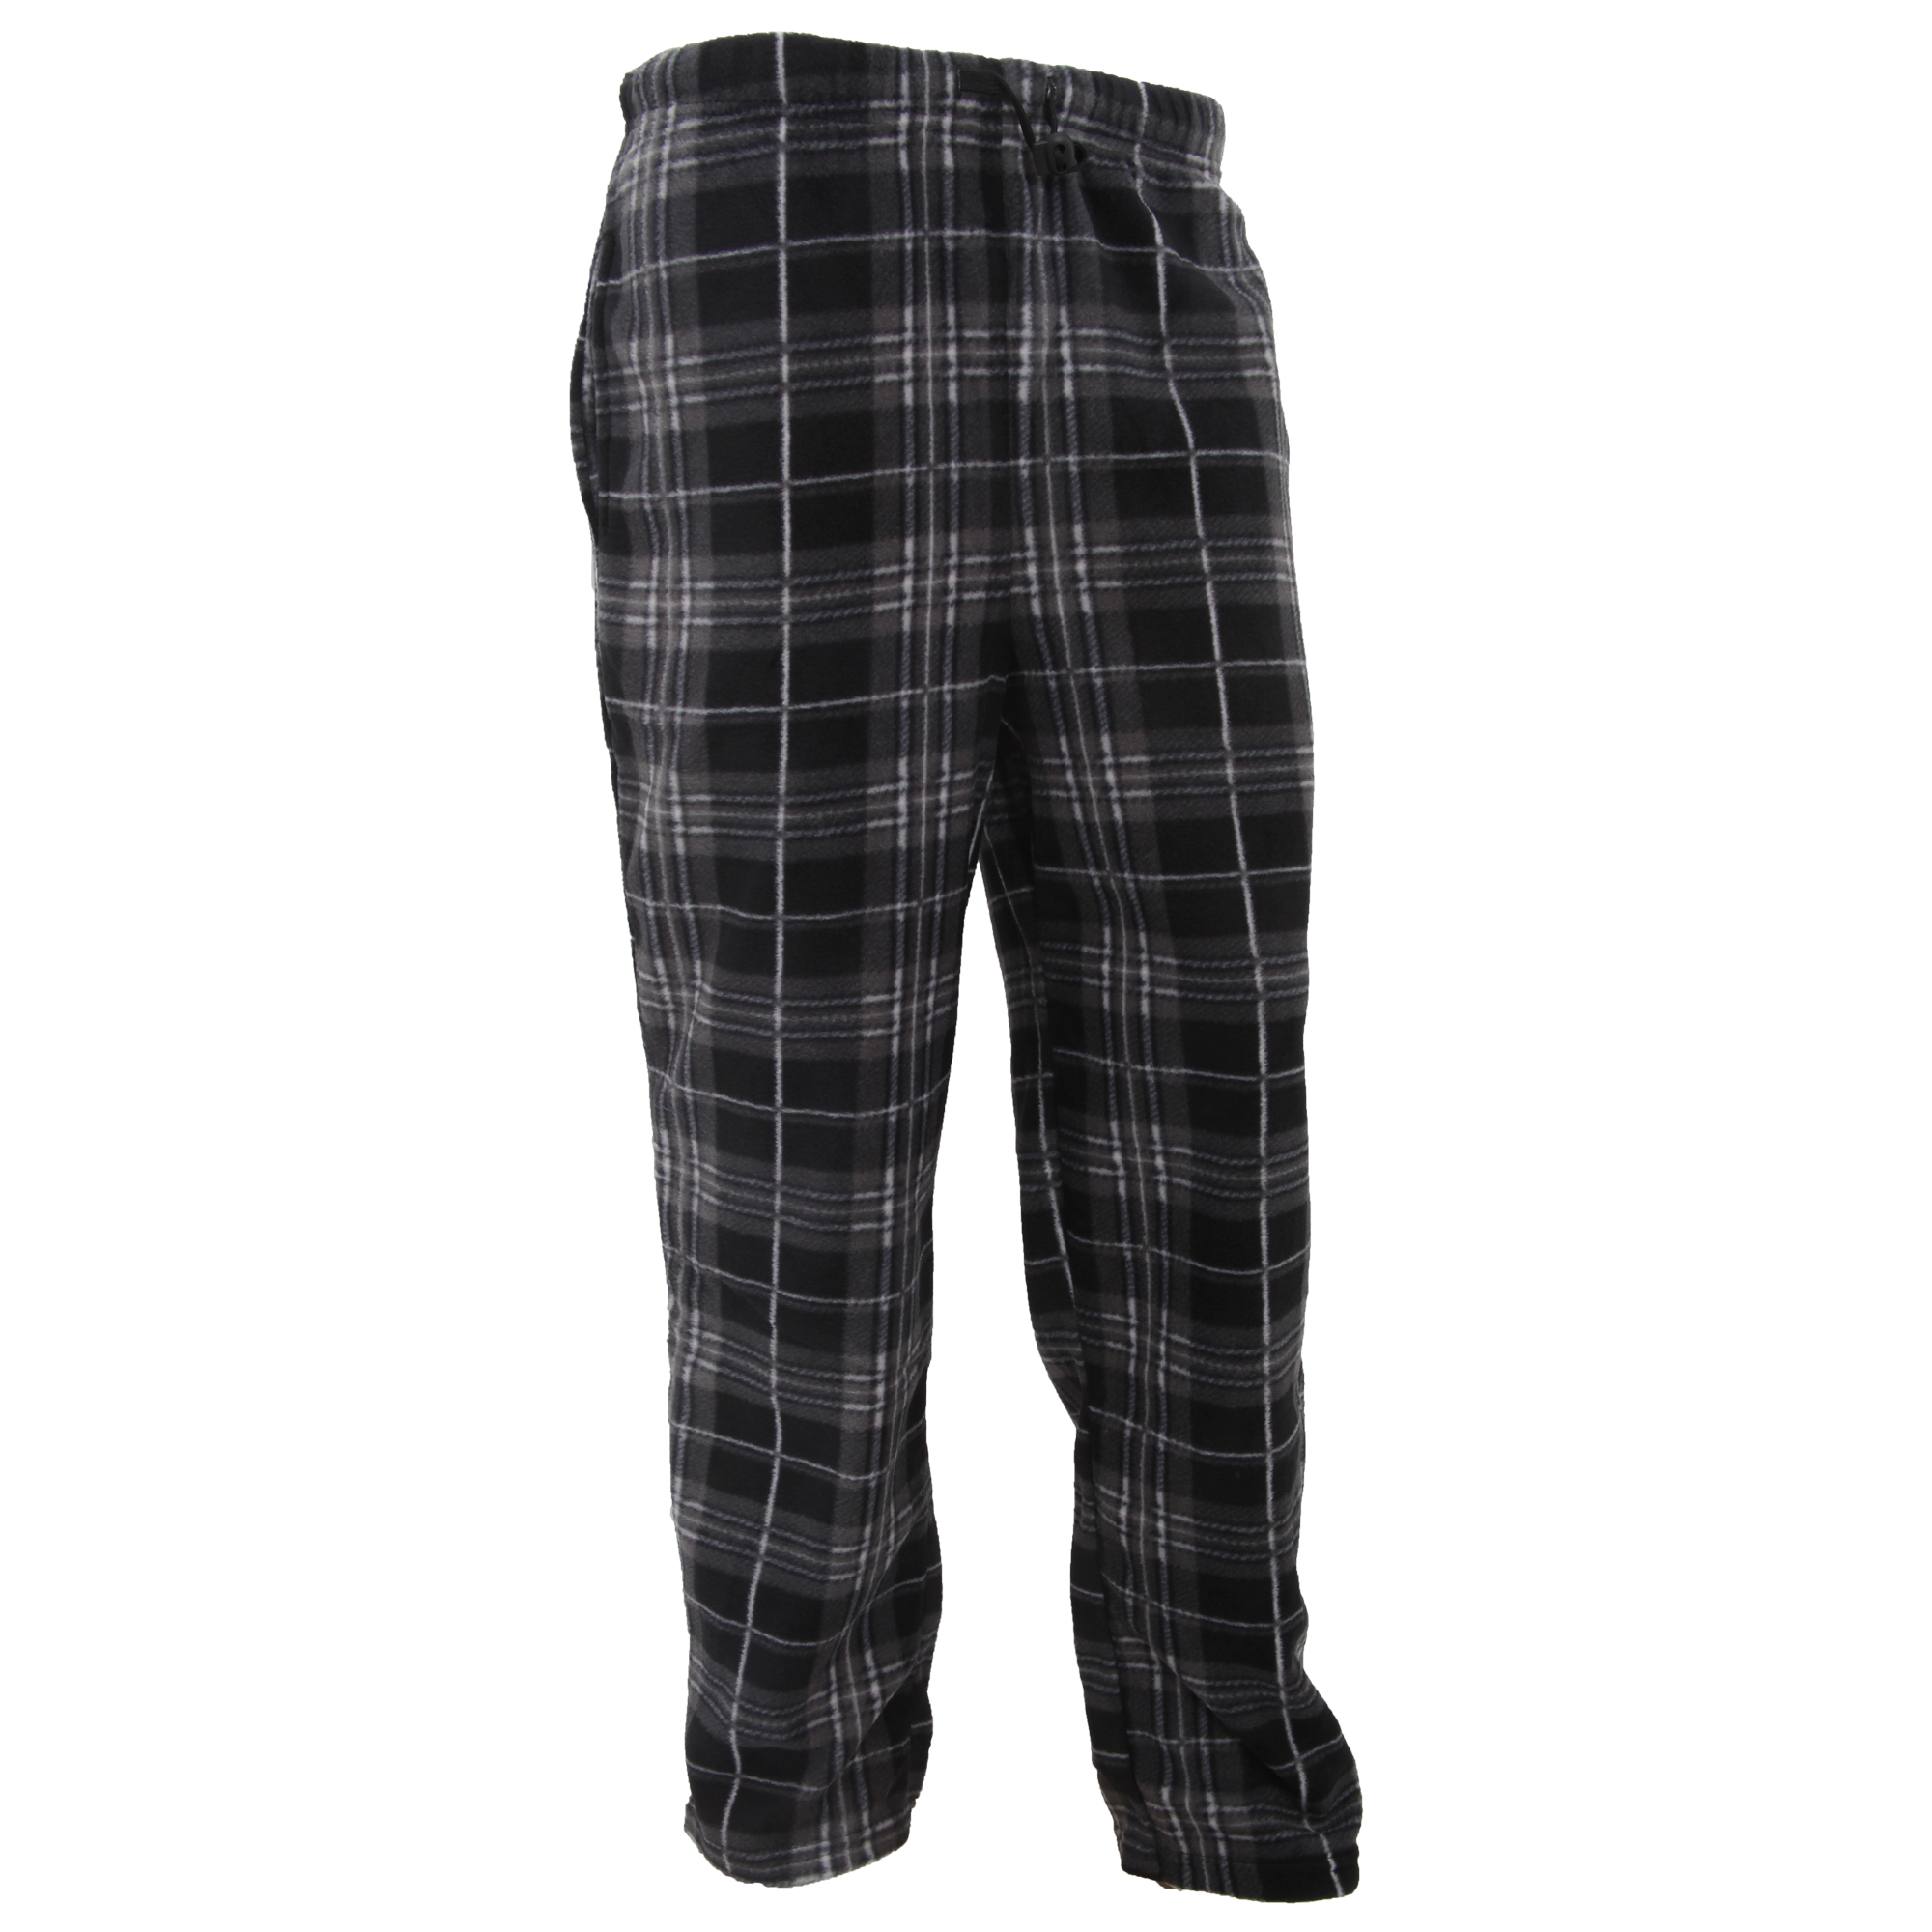 pantalon de pyjama homme ebay. Black Bedroom Furniture Sets. Home Design Ideas